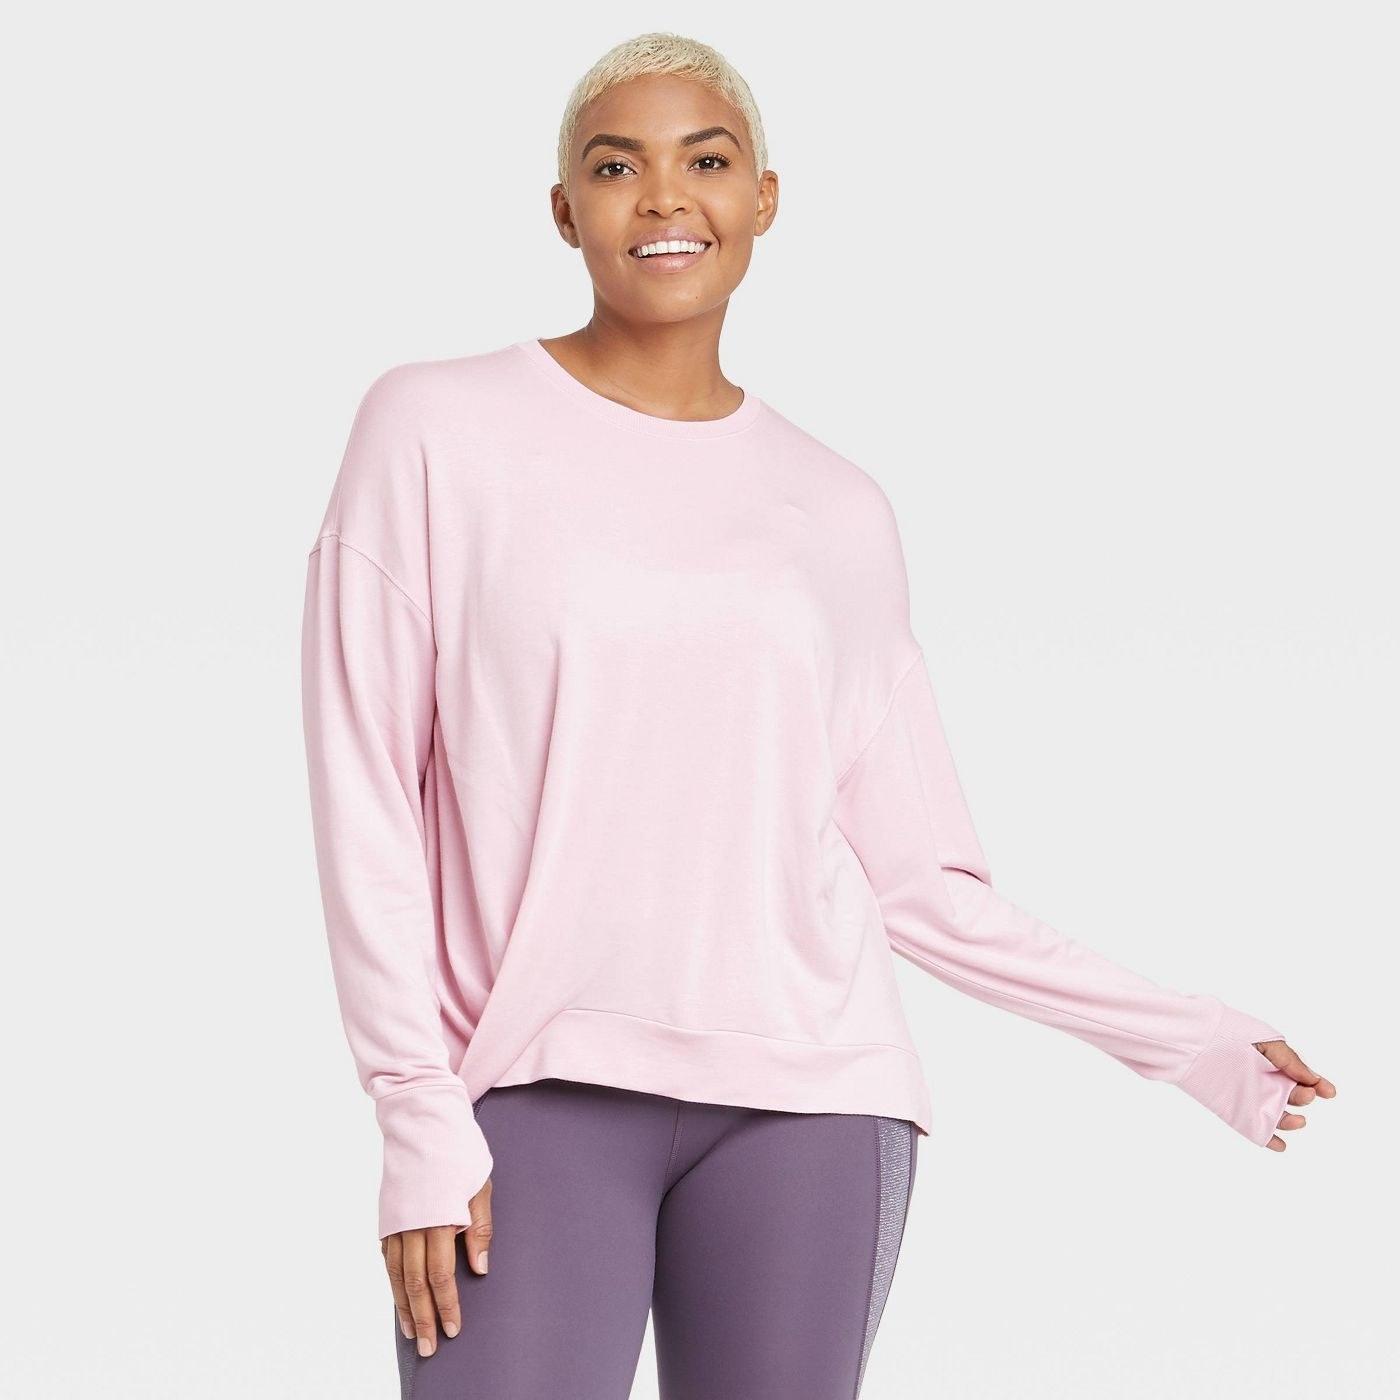 model in pink top